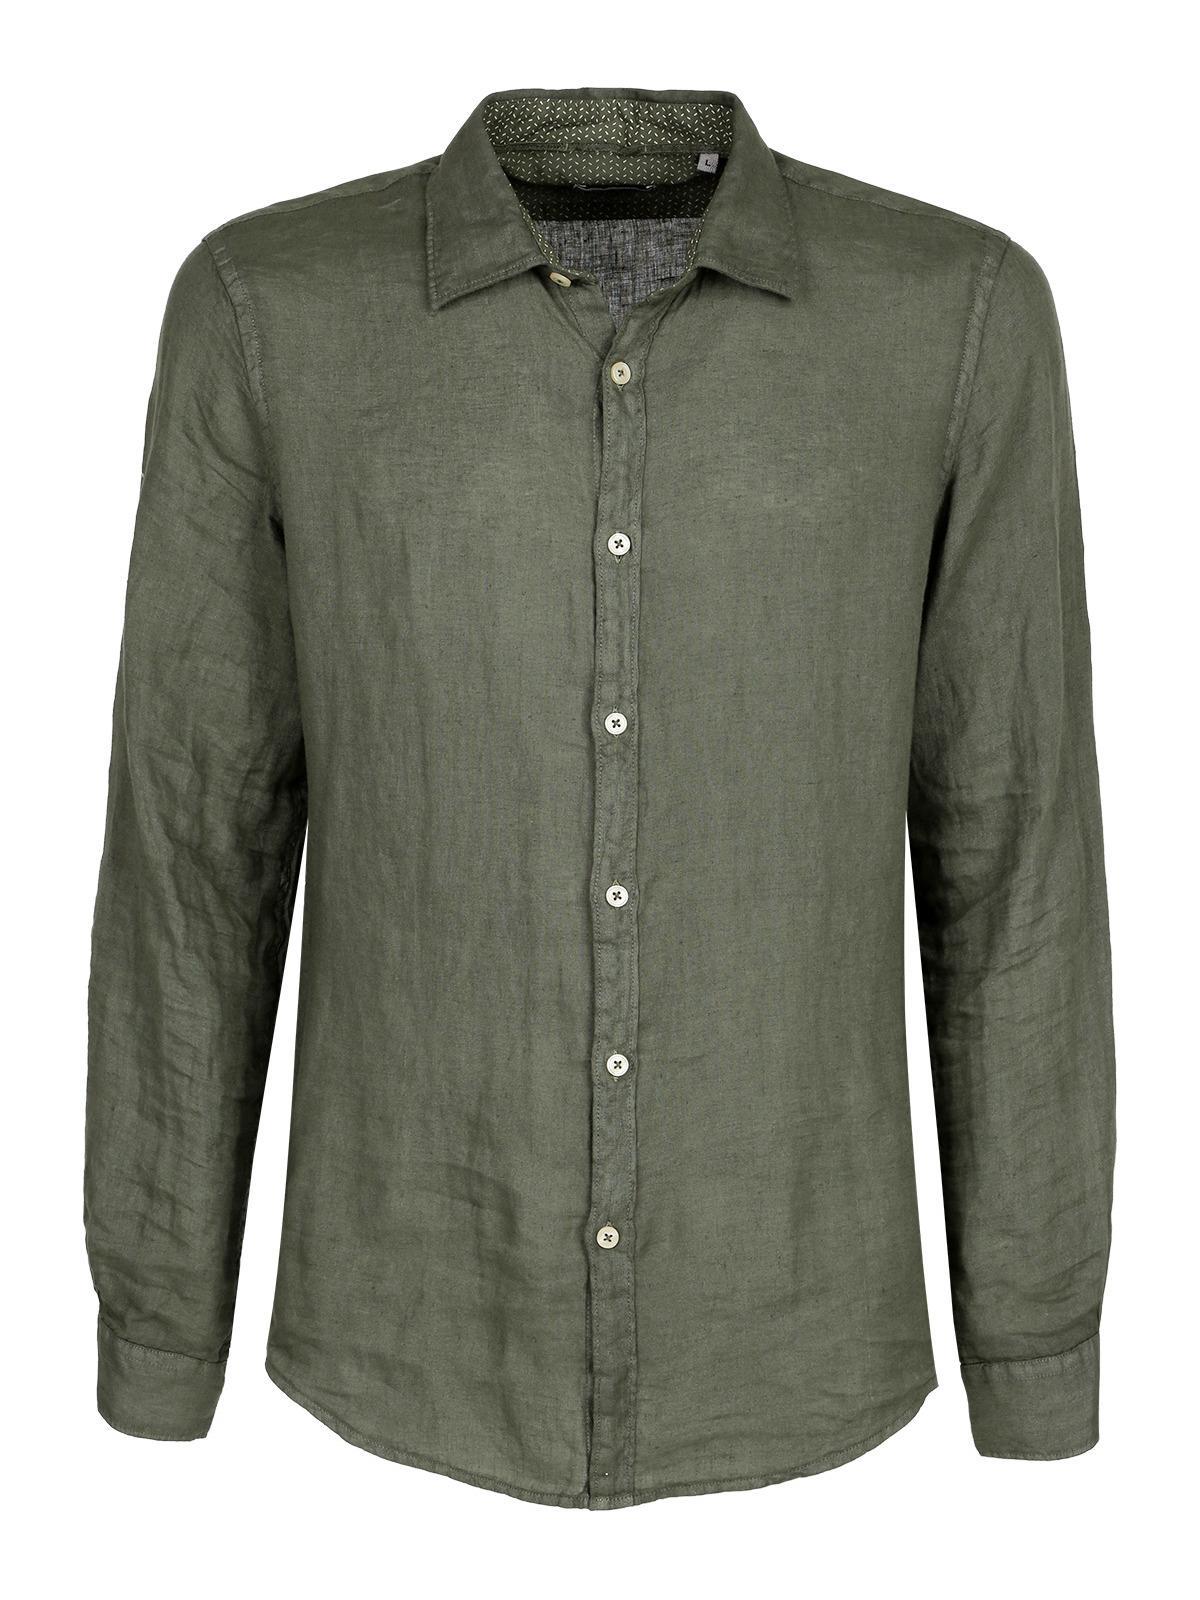 info for b3409 b9580 Camicia di lino a maniche lunghe - verde b-style | MecShopping